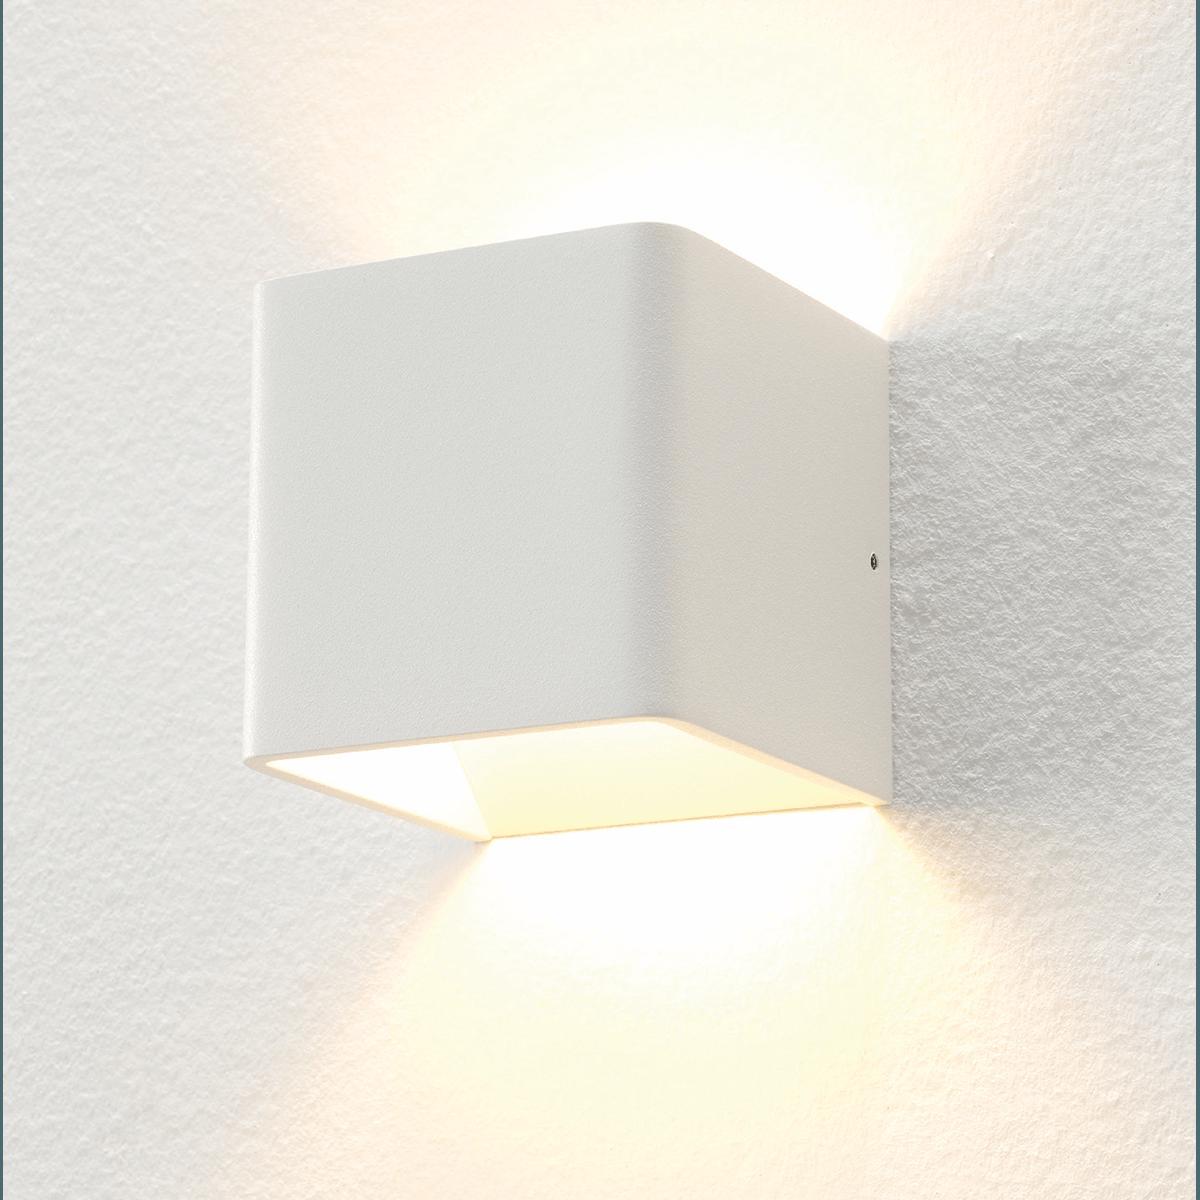 "Wandlamp wit 1-lichts ""Fulda"" 10x10x10cm LED 6W 2700K 500lm"